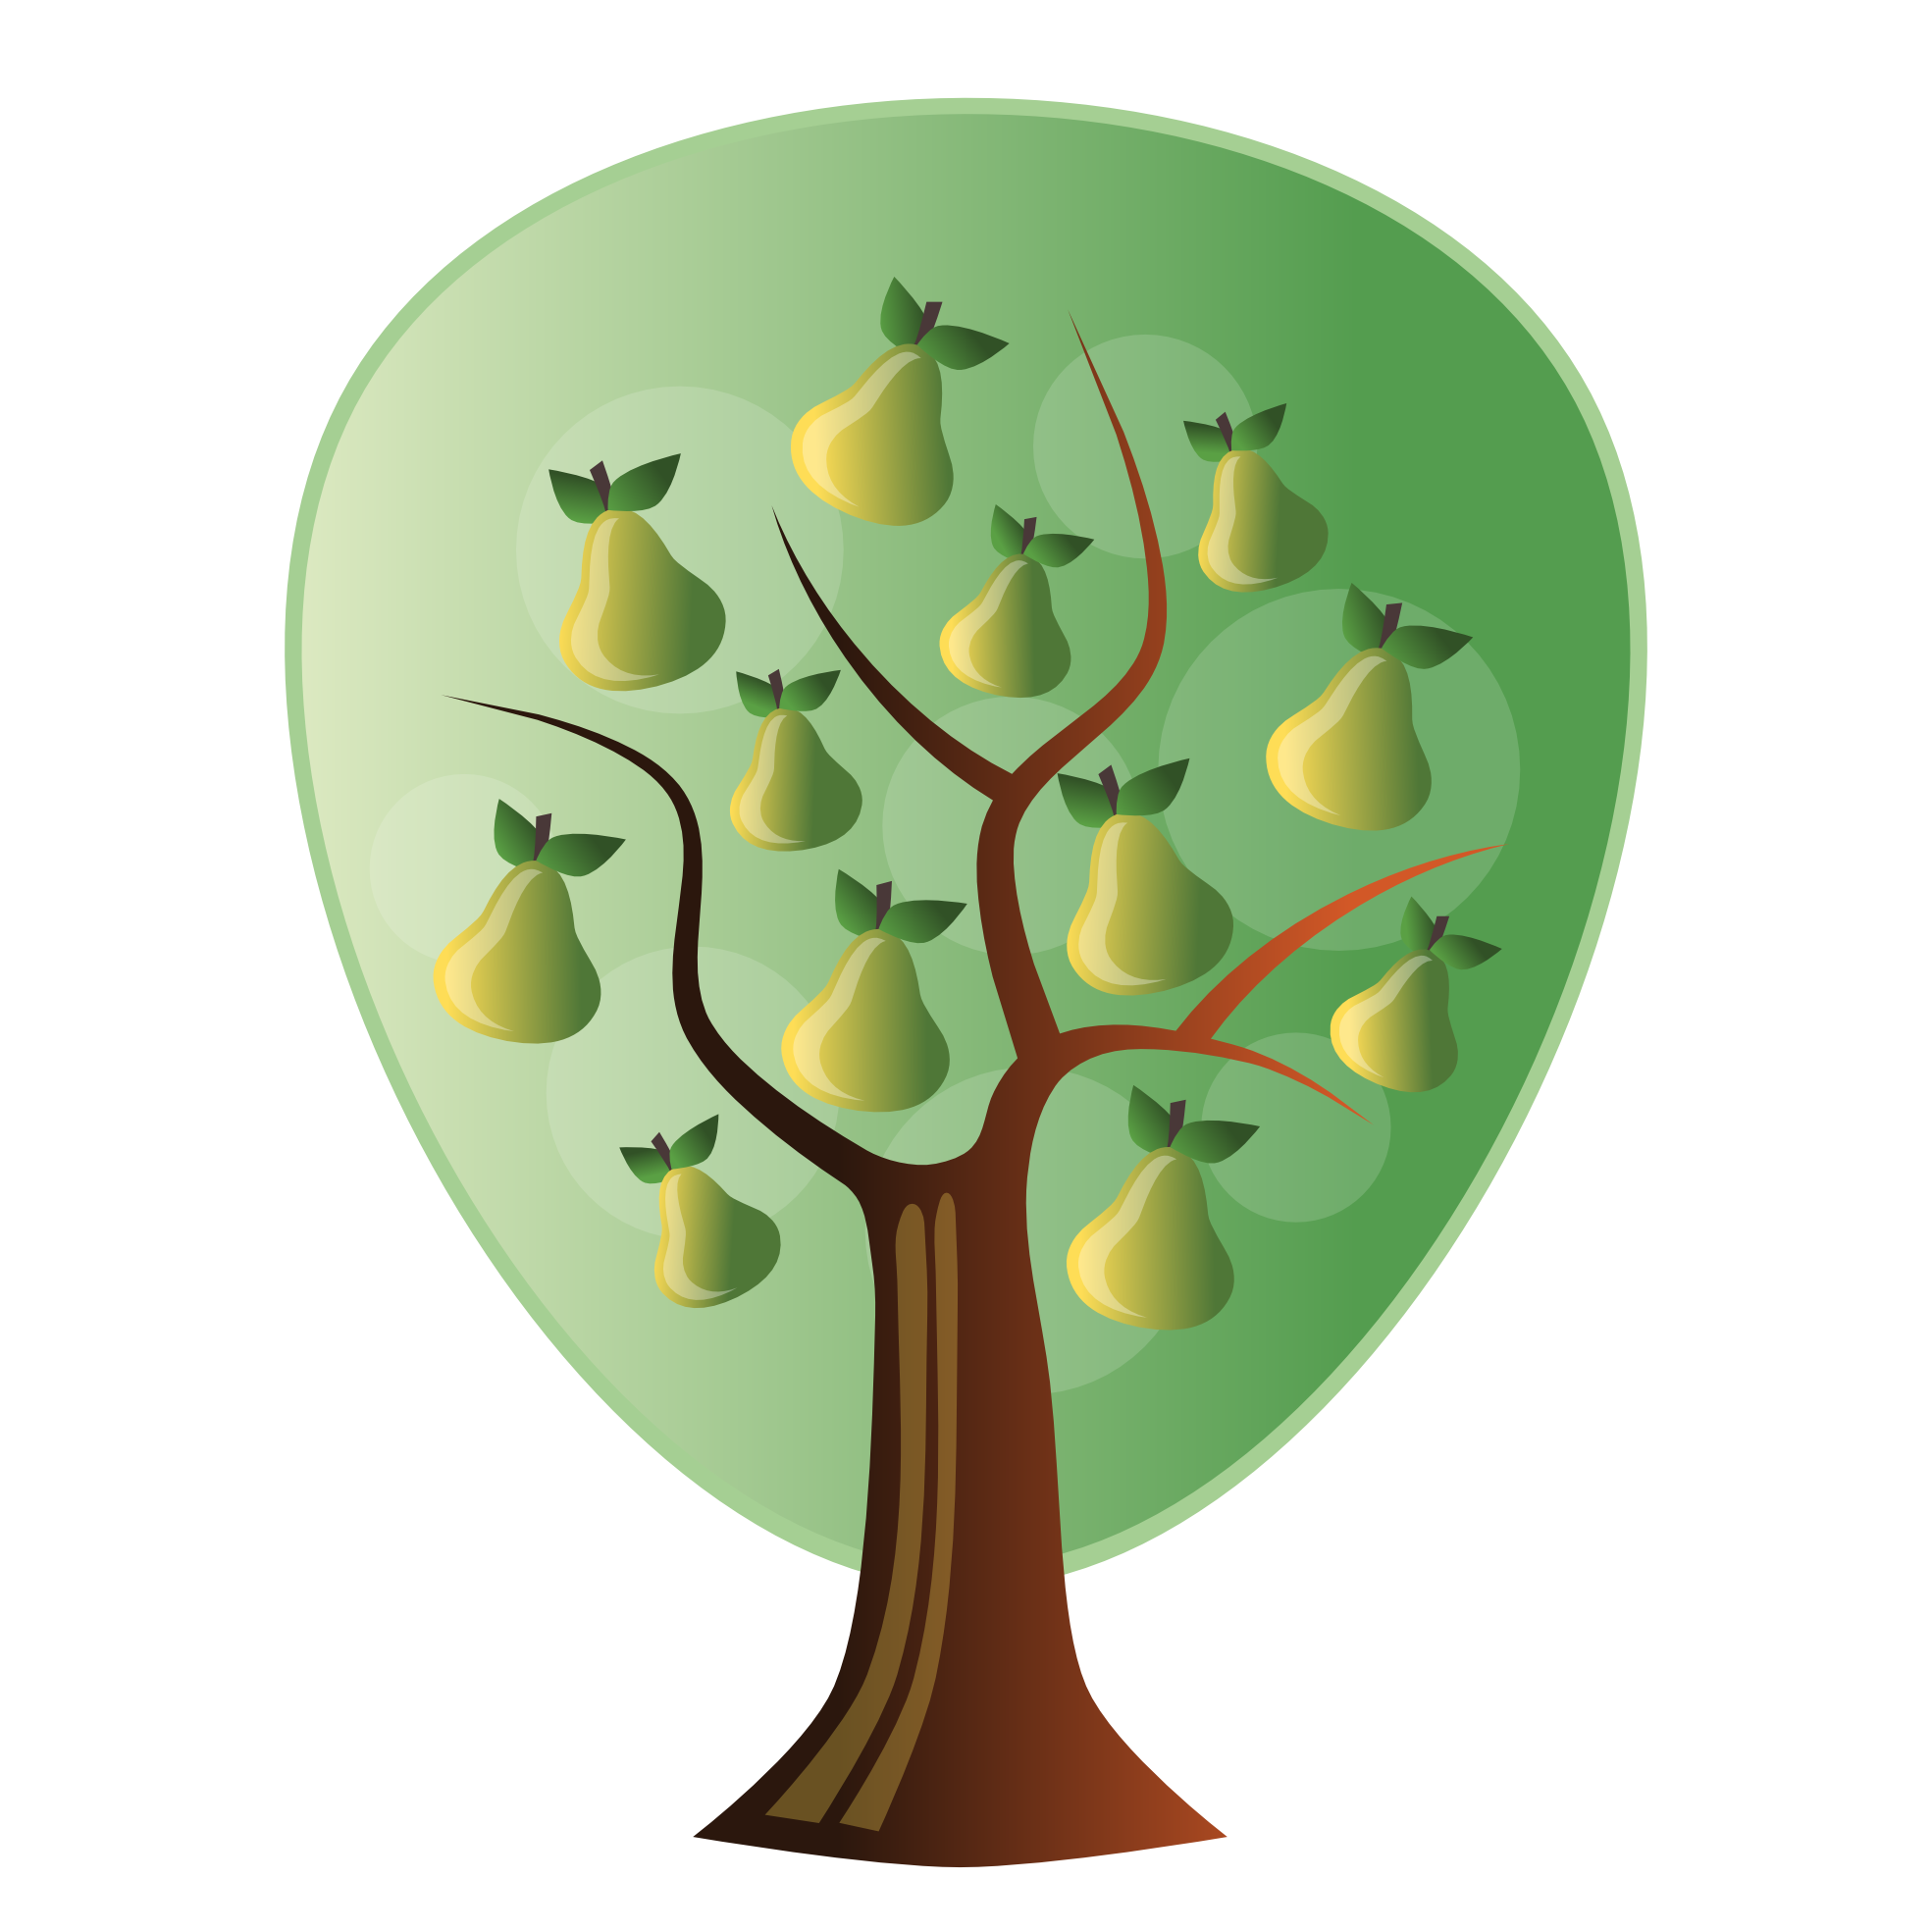 Pear tree clipart translucent.